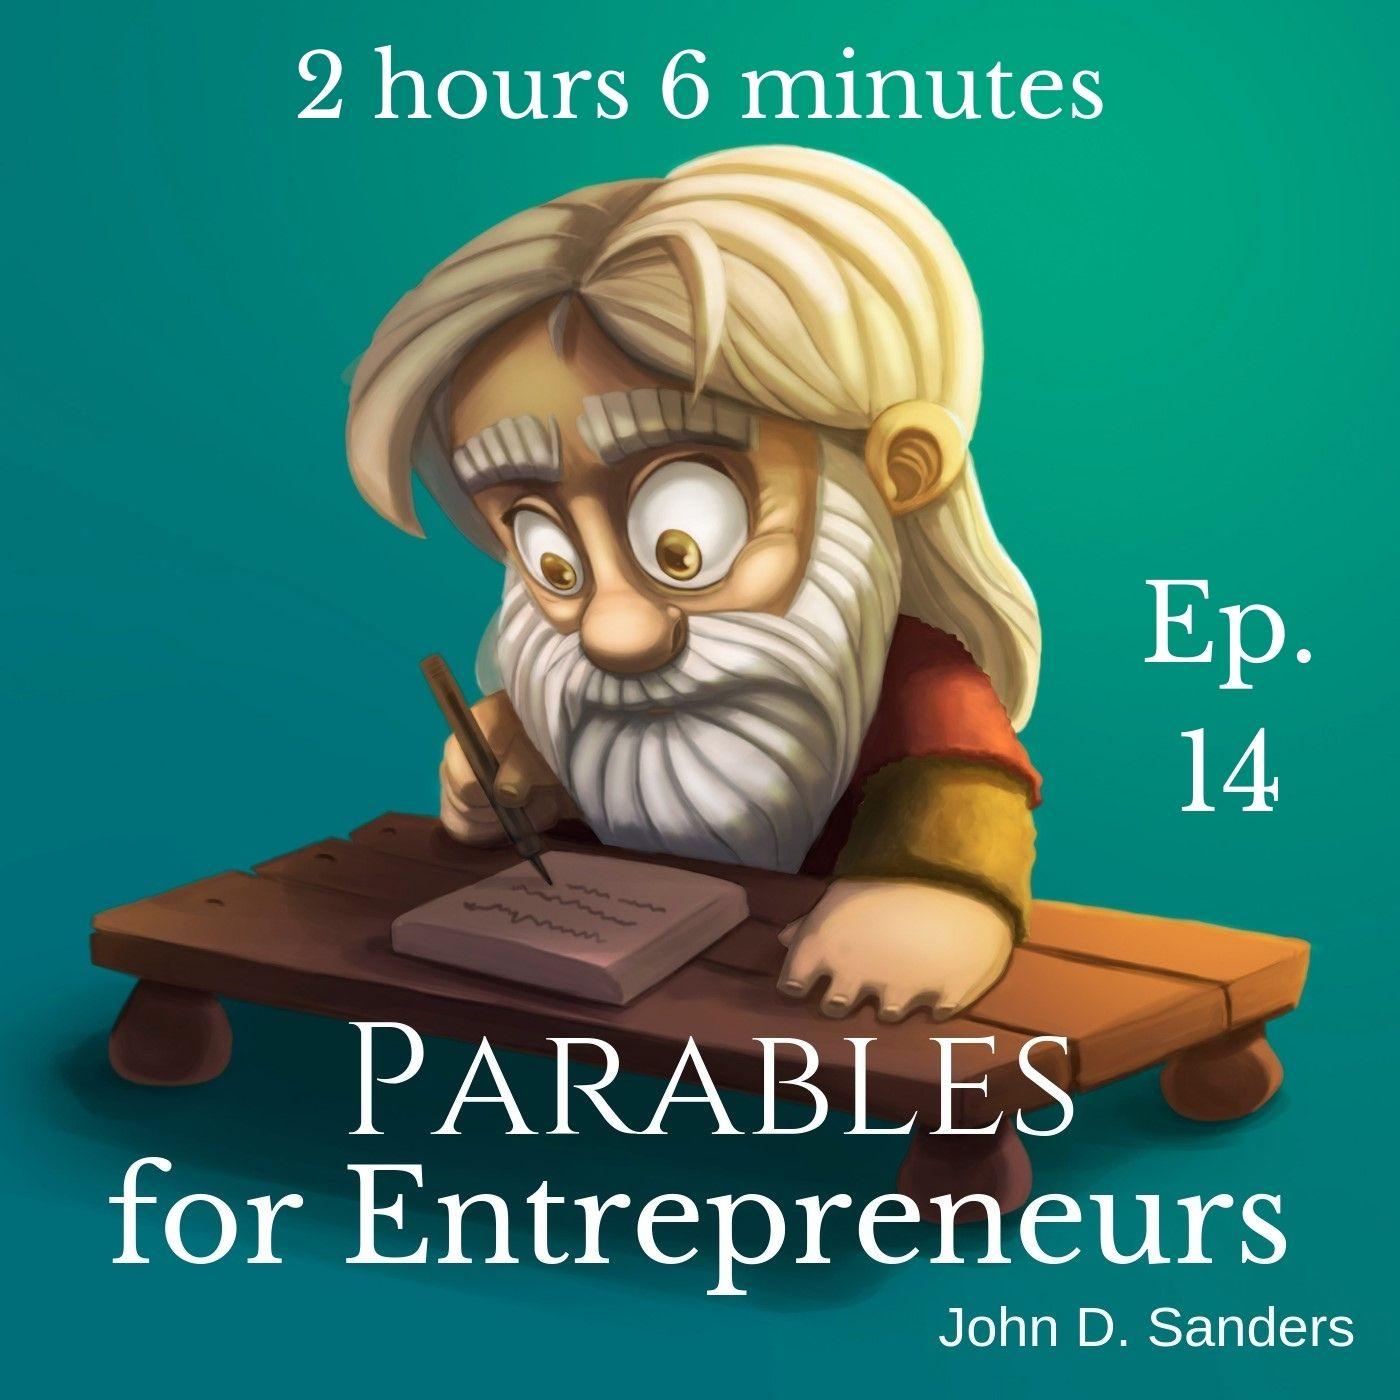 Ep. 14 Parables for Entrepreneurs (2hrs 6mins)